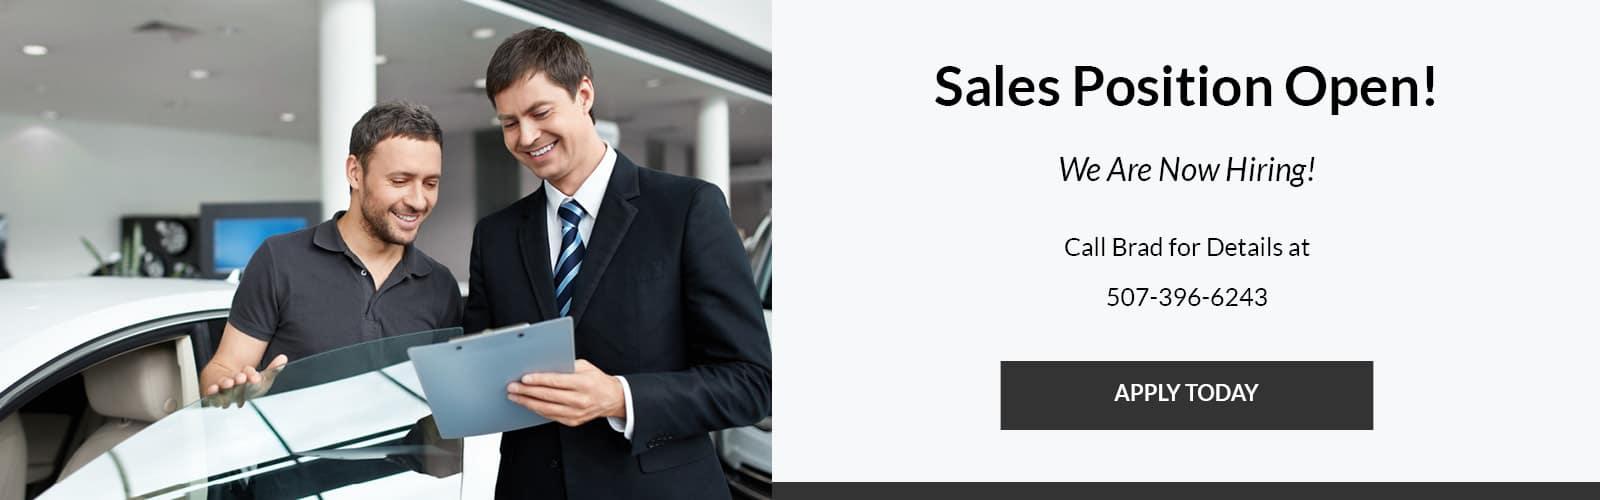 Covid_Sales_Hours_1600x500_TEMP